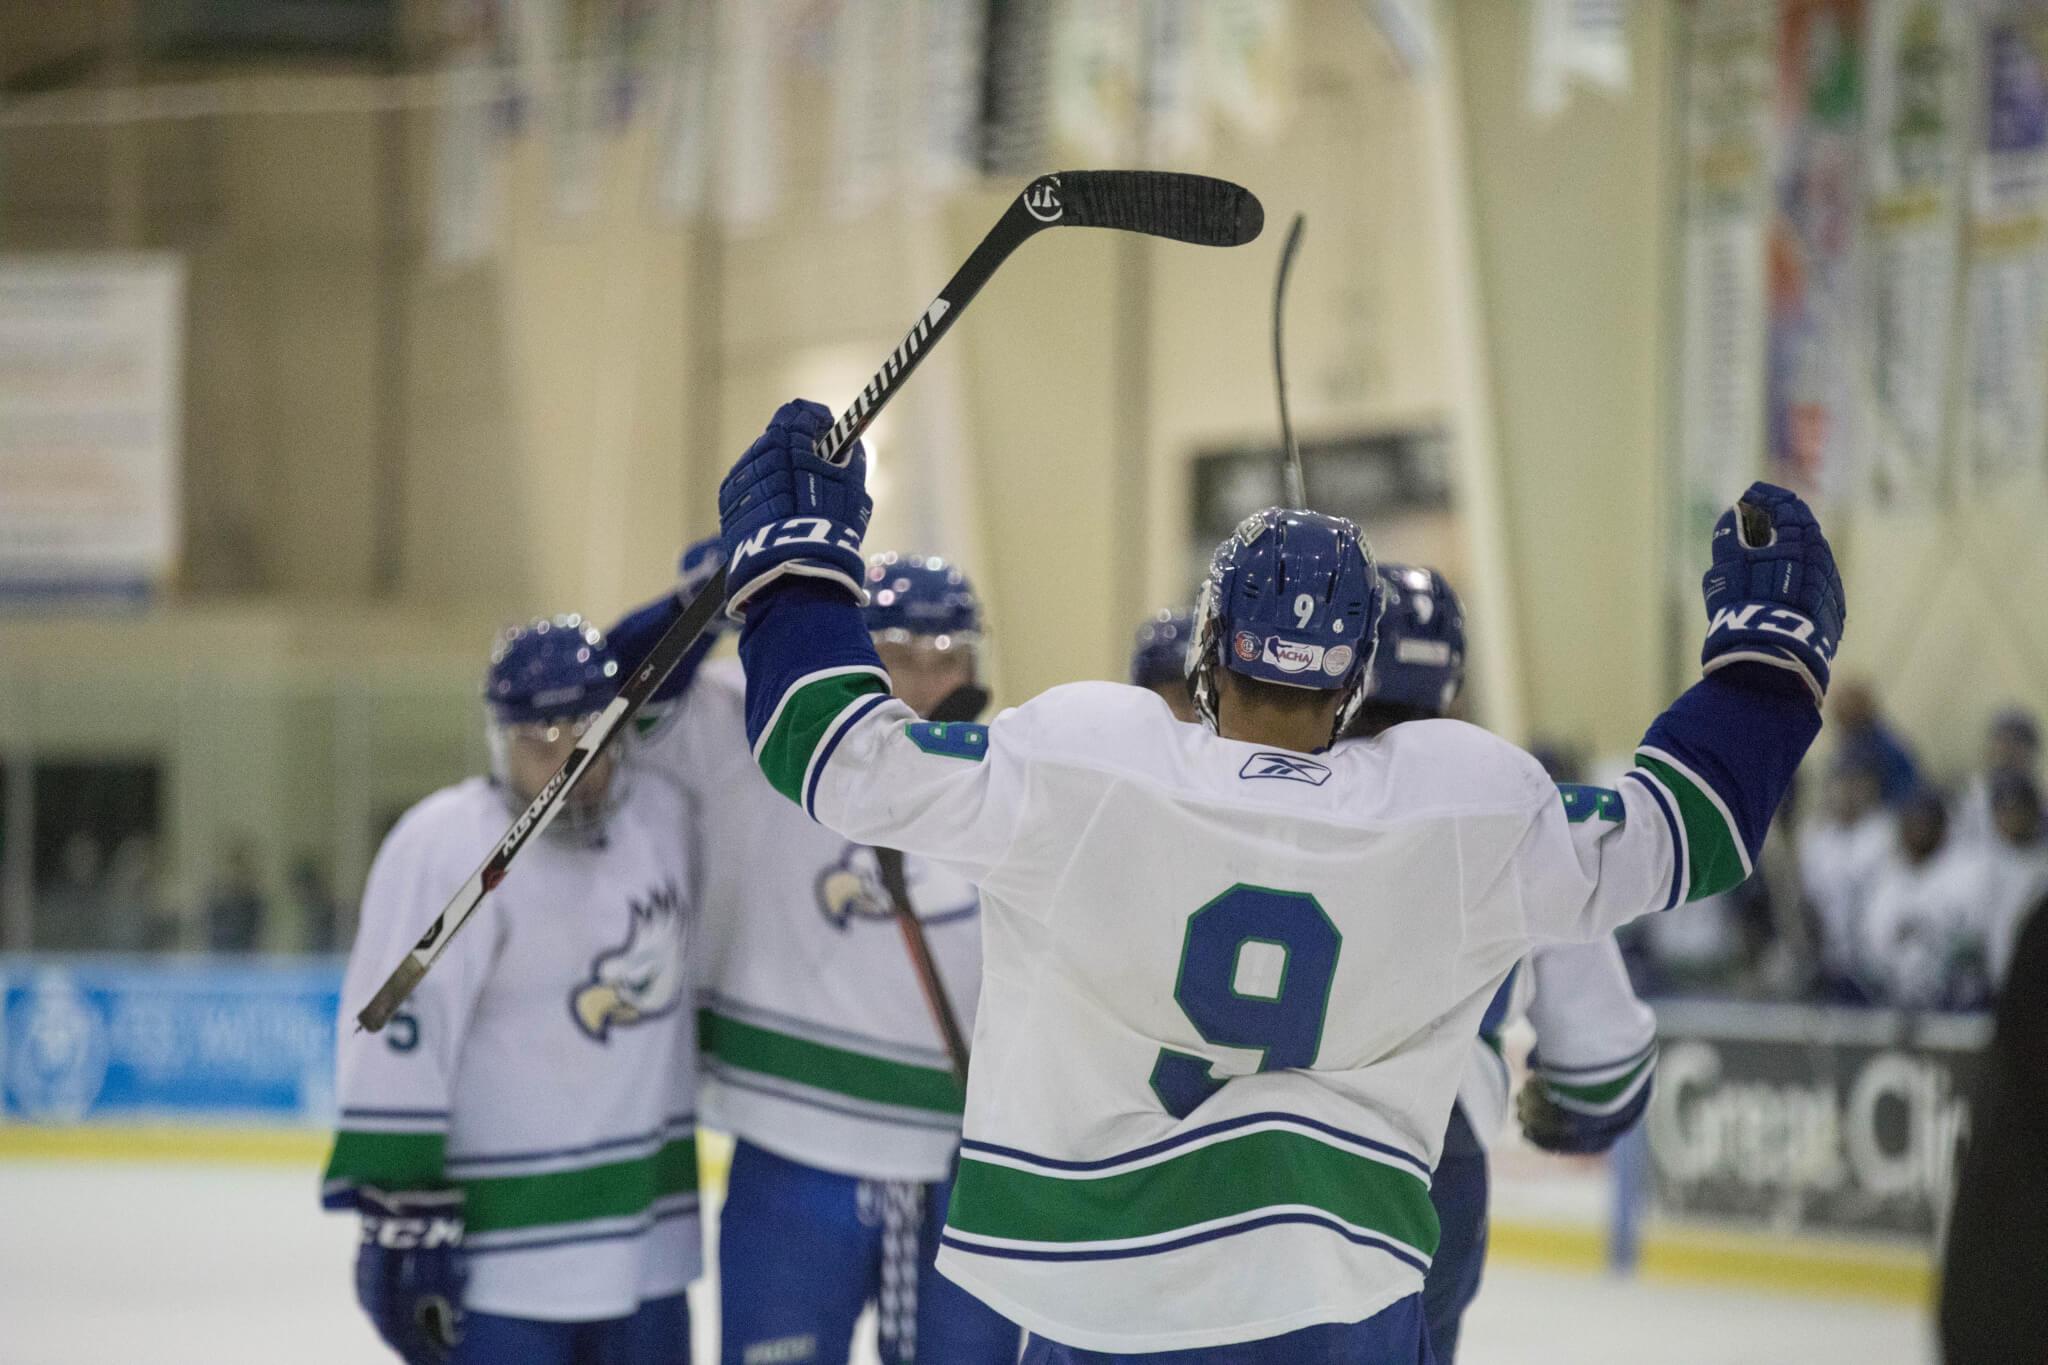 FGCU DII hockey ends regular season unbeaten at home